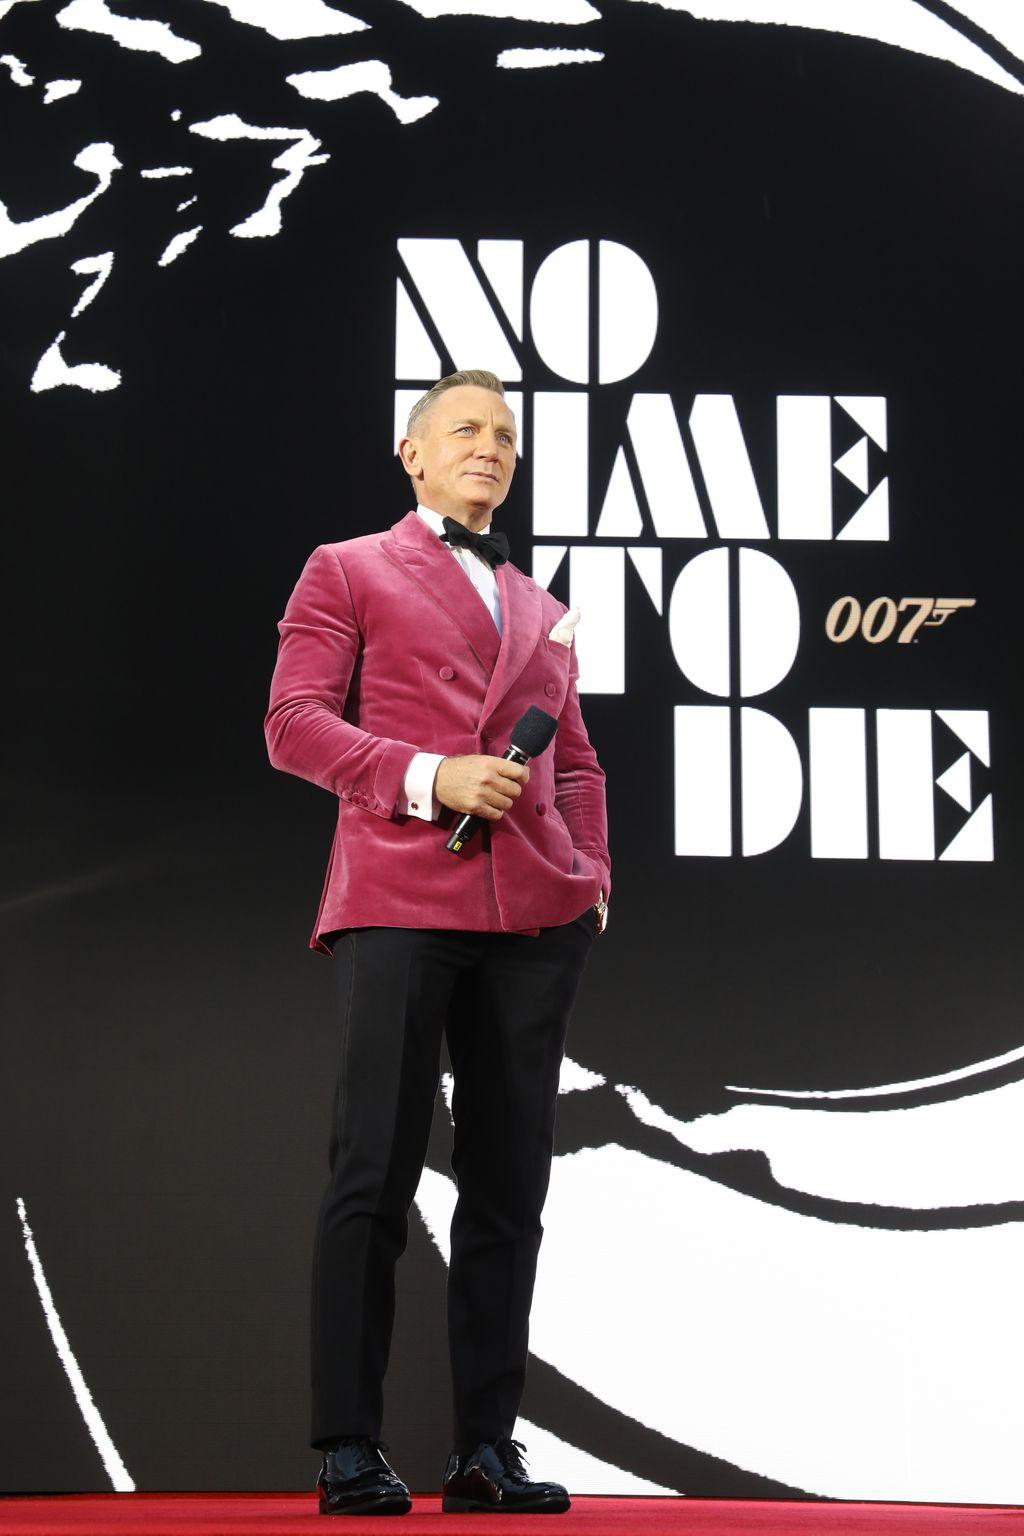 LONDON, ENGLAND - SEPTEMBER 28: Daniel Craig attends the World Premiere of